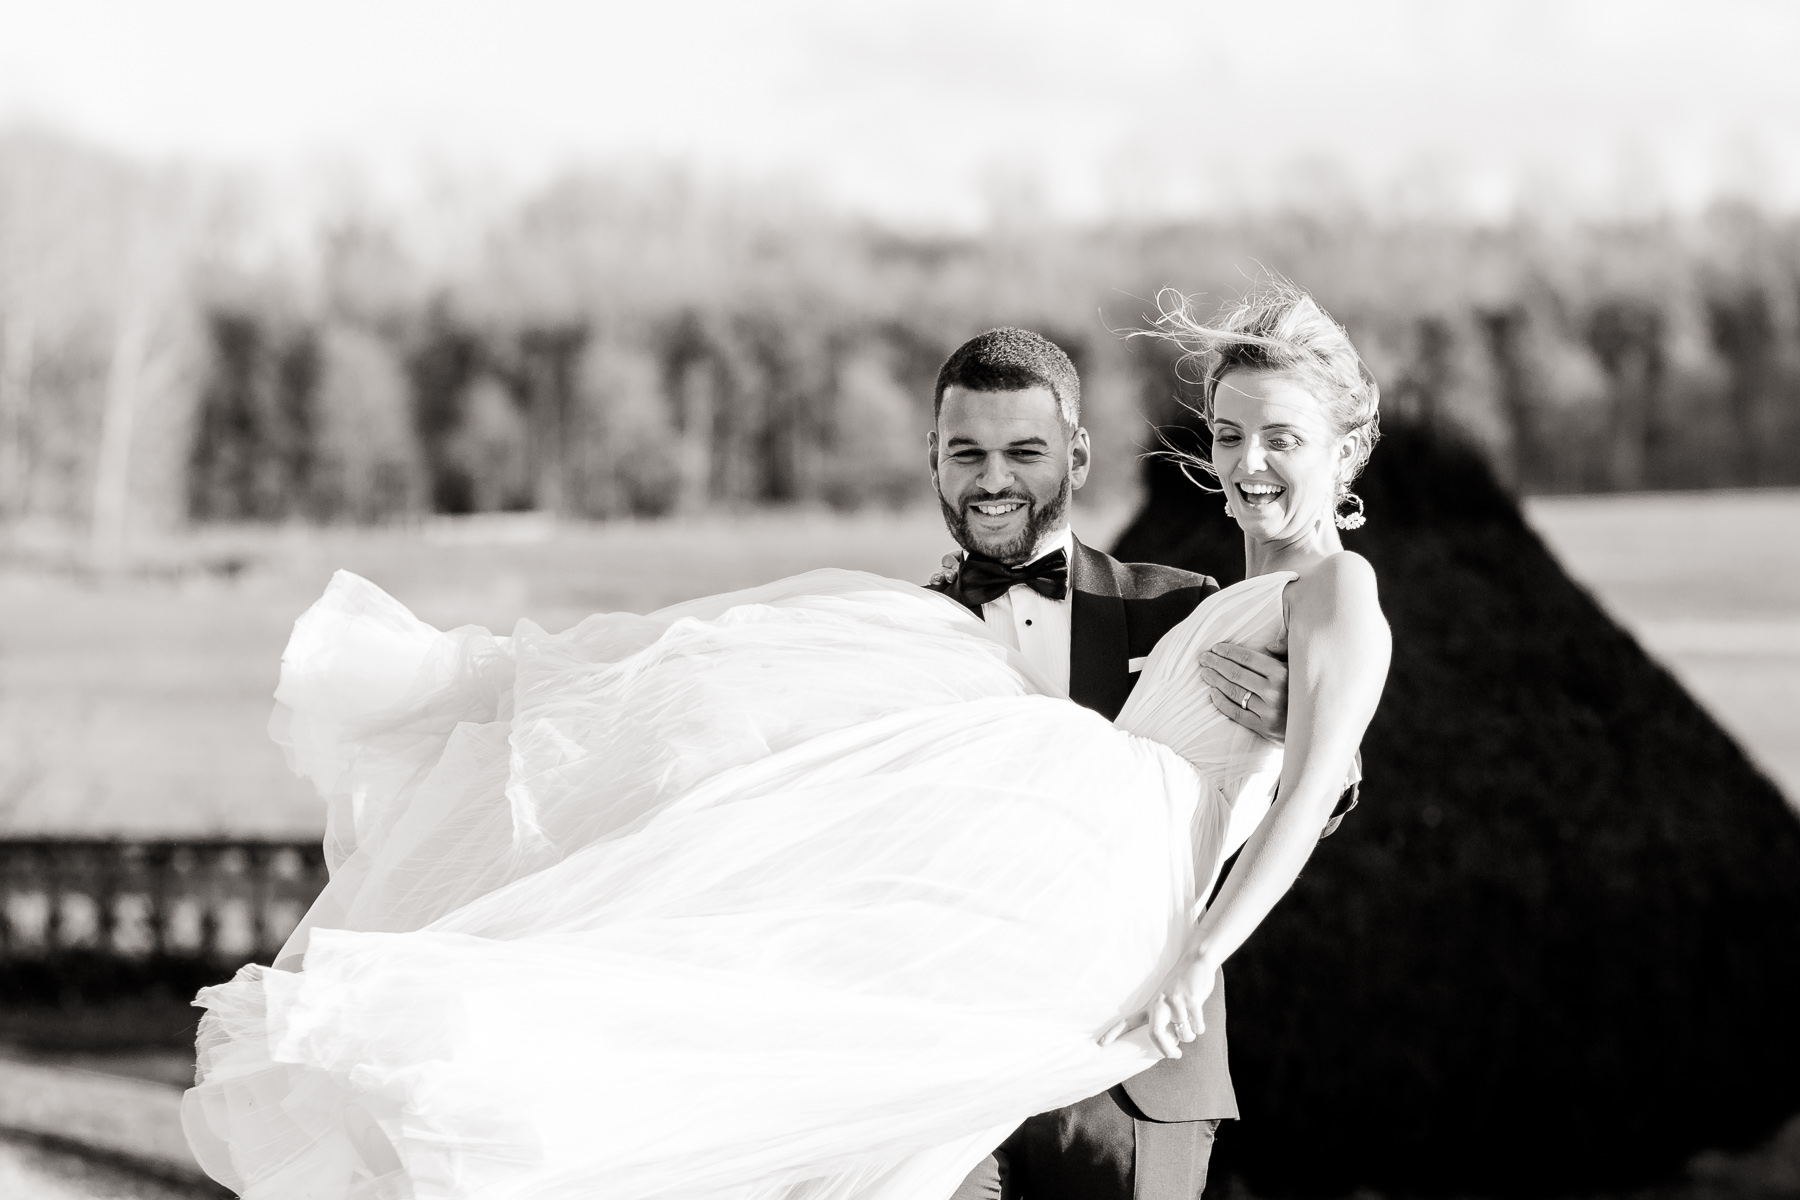 hochzeitsfotograf England uk jane weber wedding photographer leicester prestwoldhall